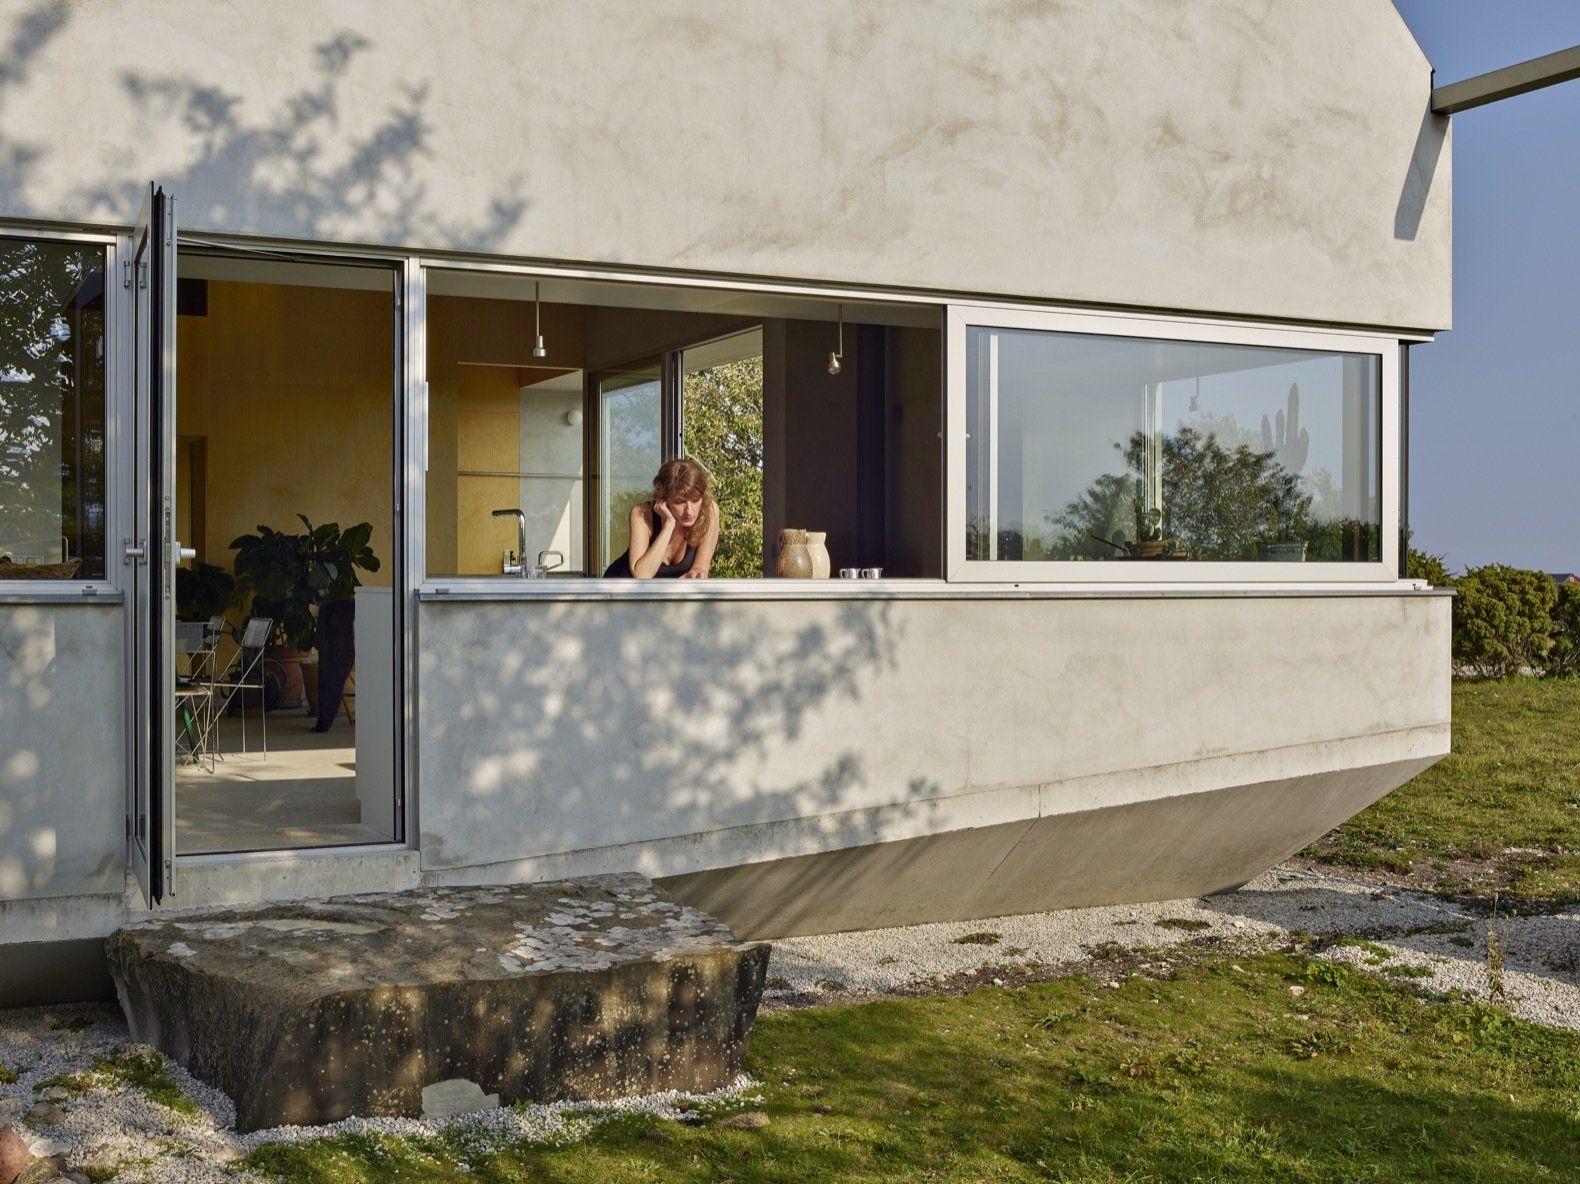 Hamra House by Collectif Encore Wins the Kasper Salin Prize